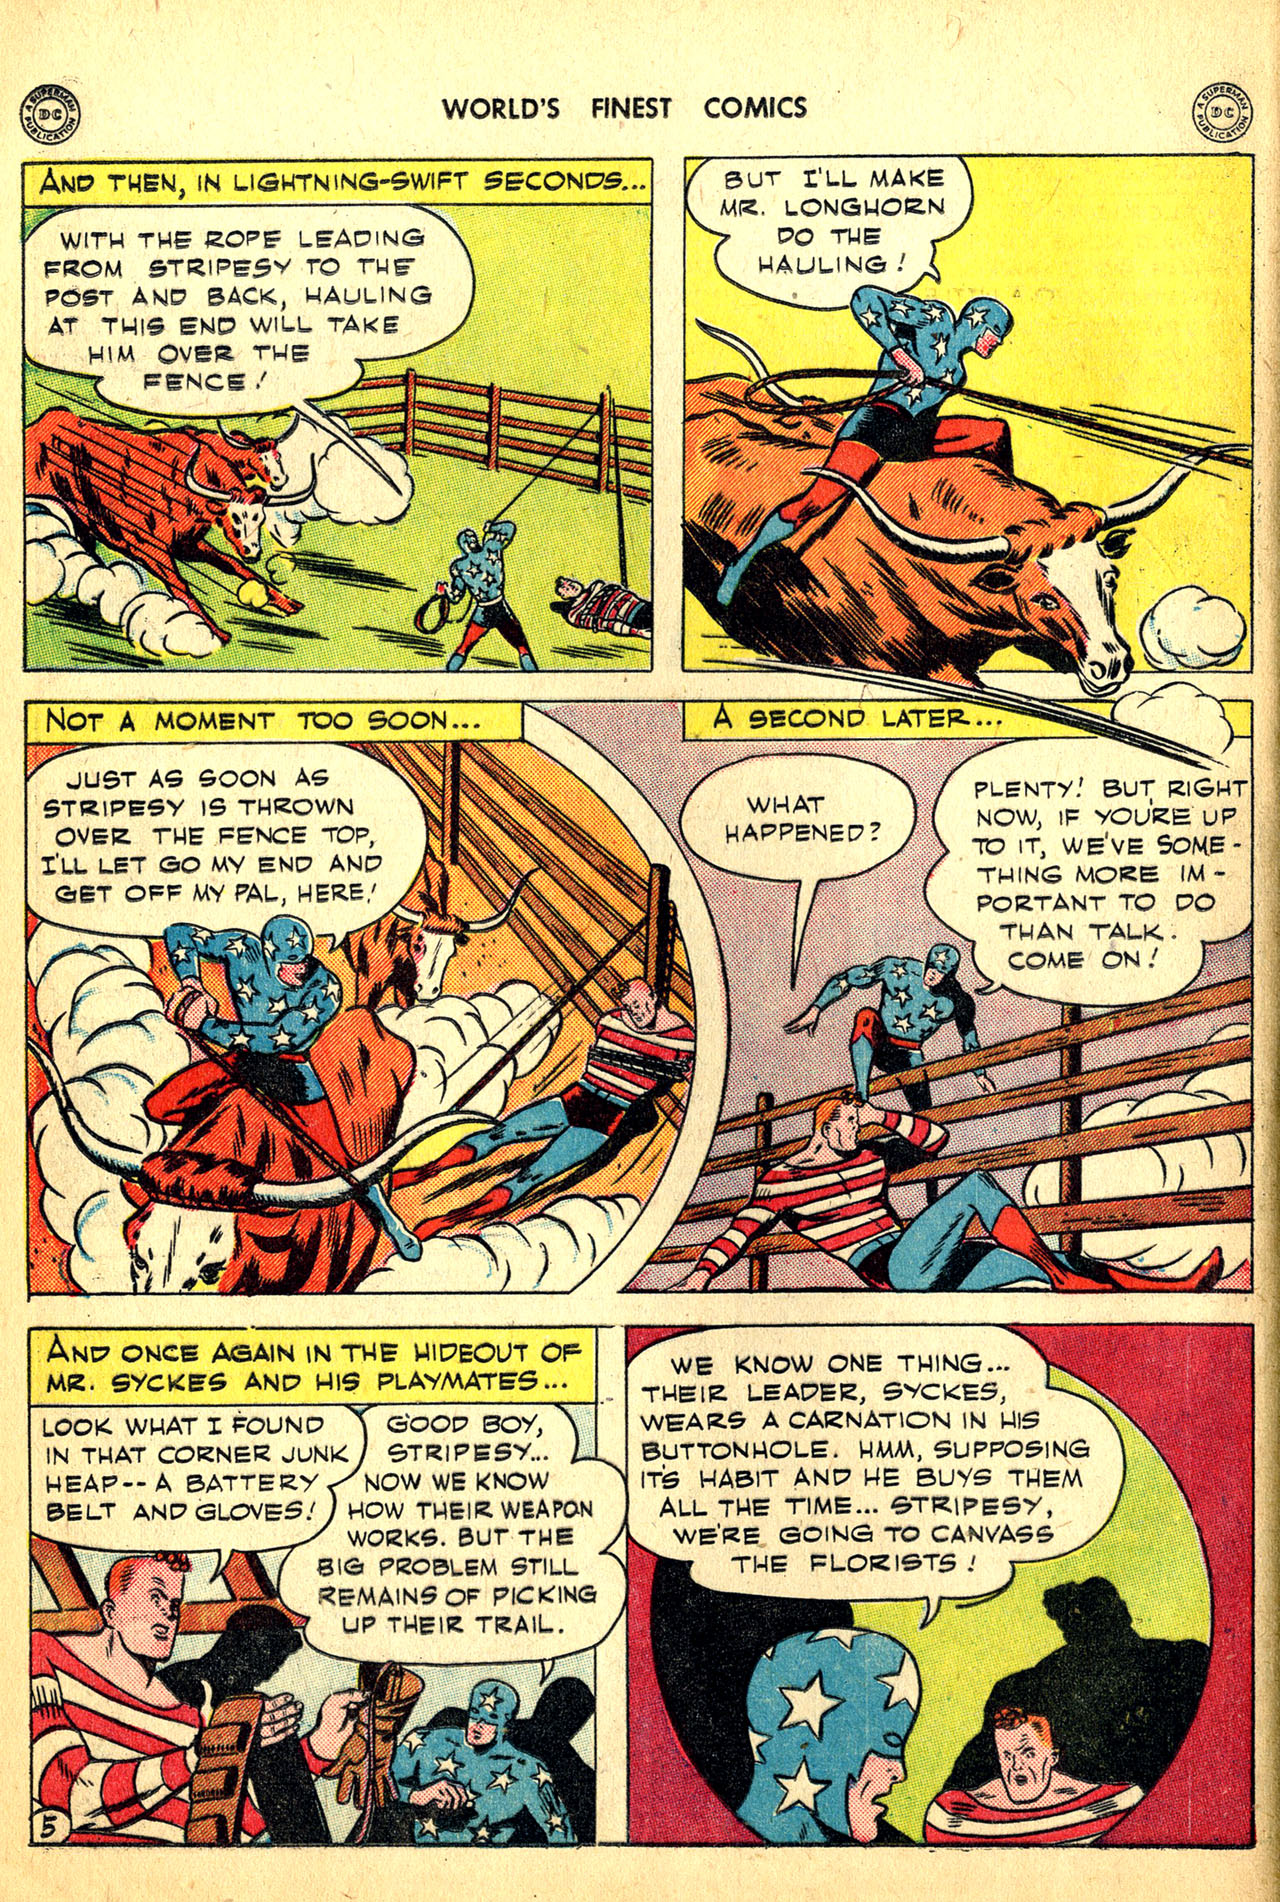 Read online World's Finest Comics comic -  Issue #18 - 20